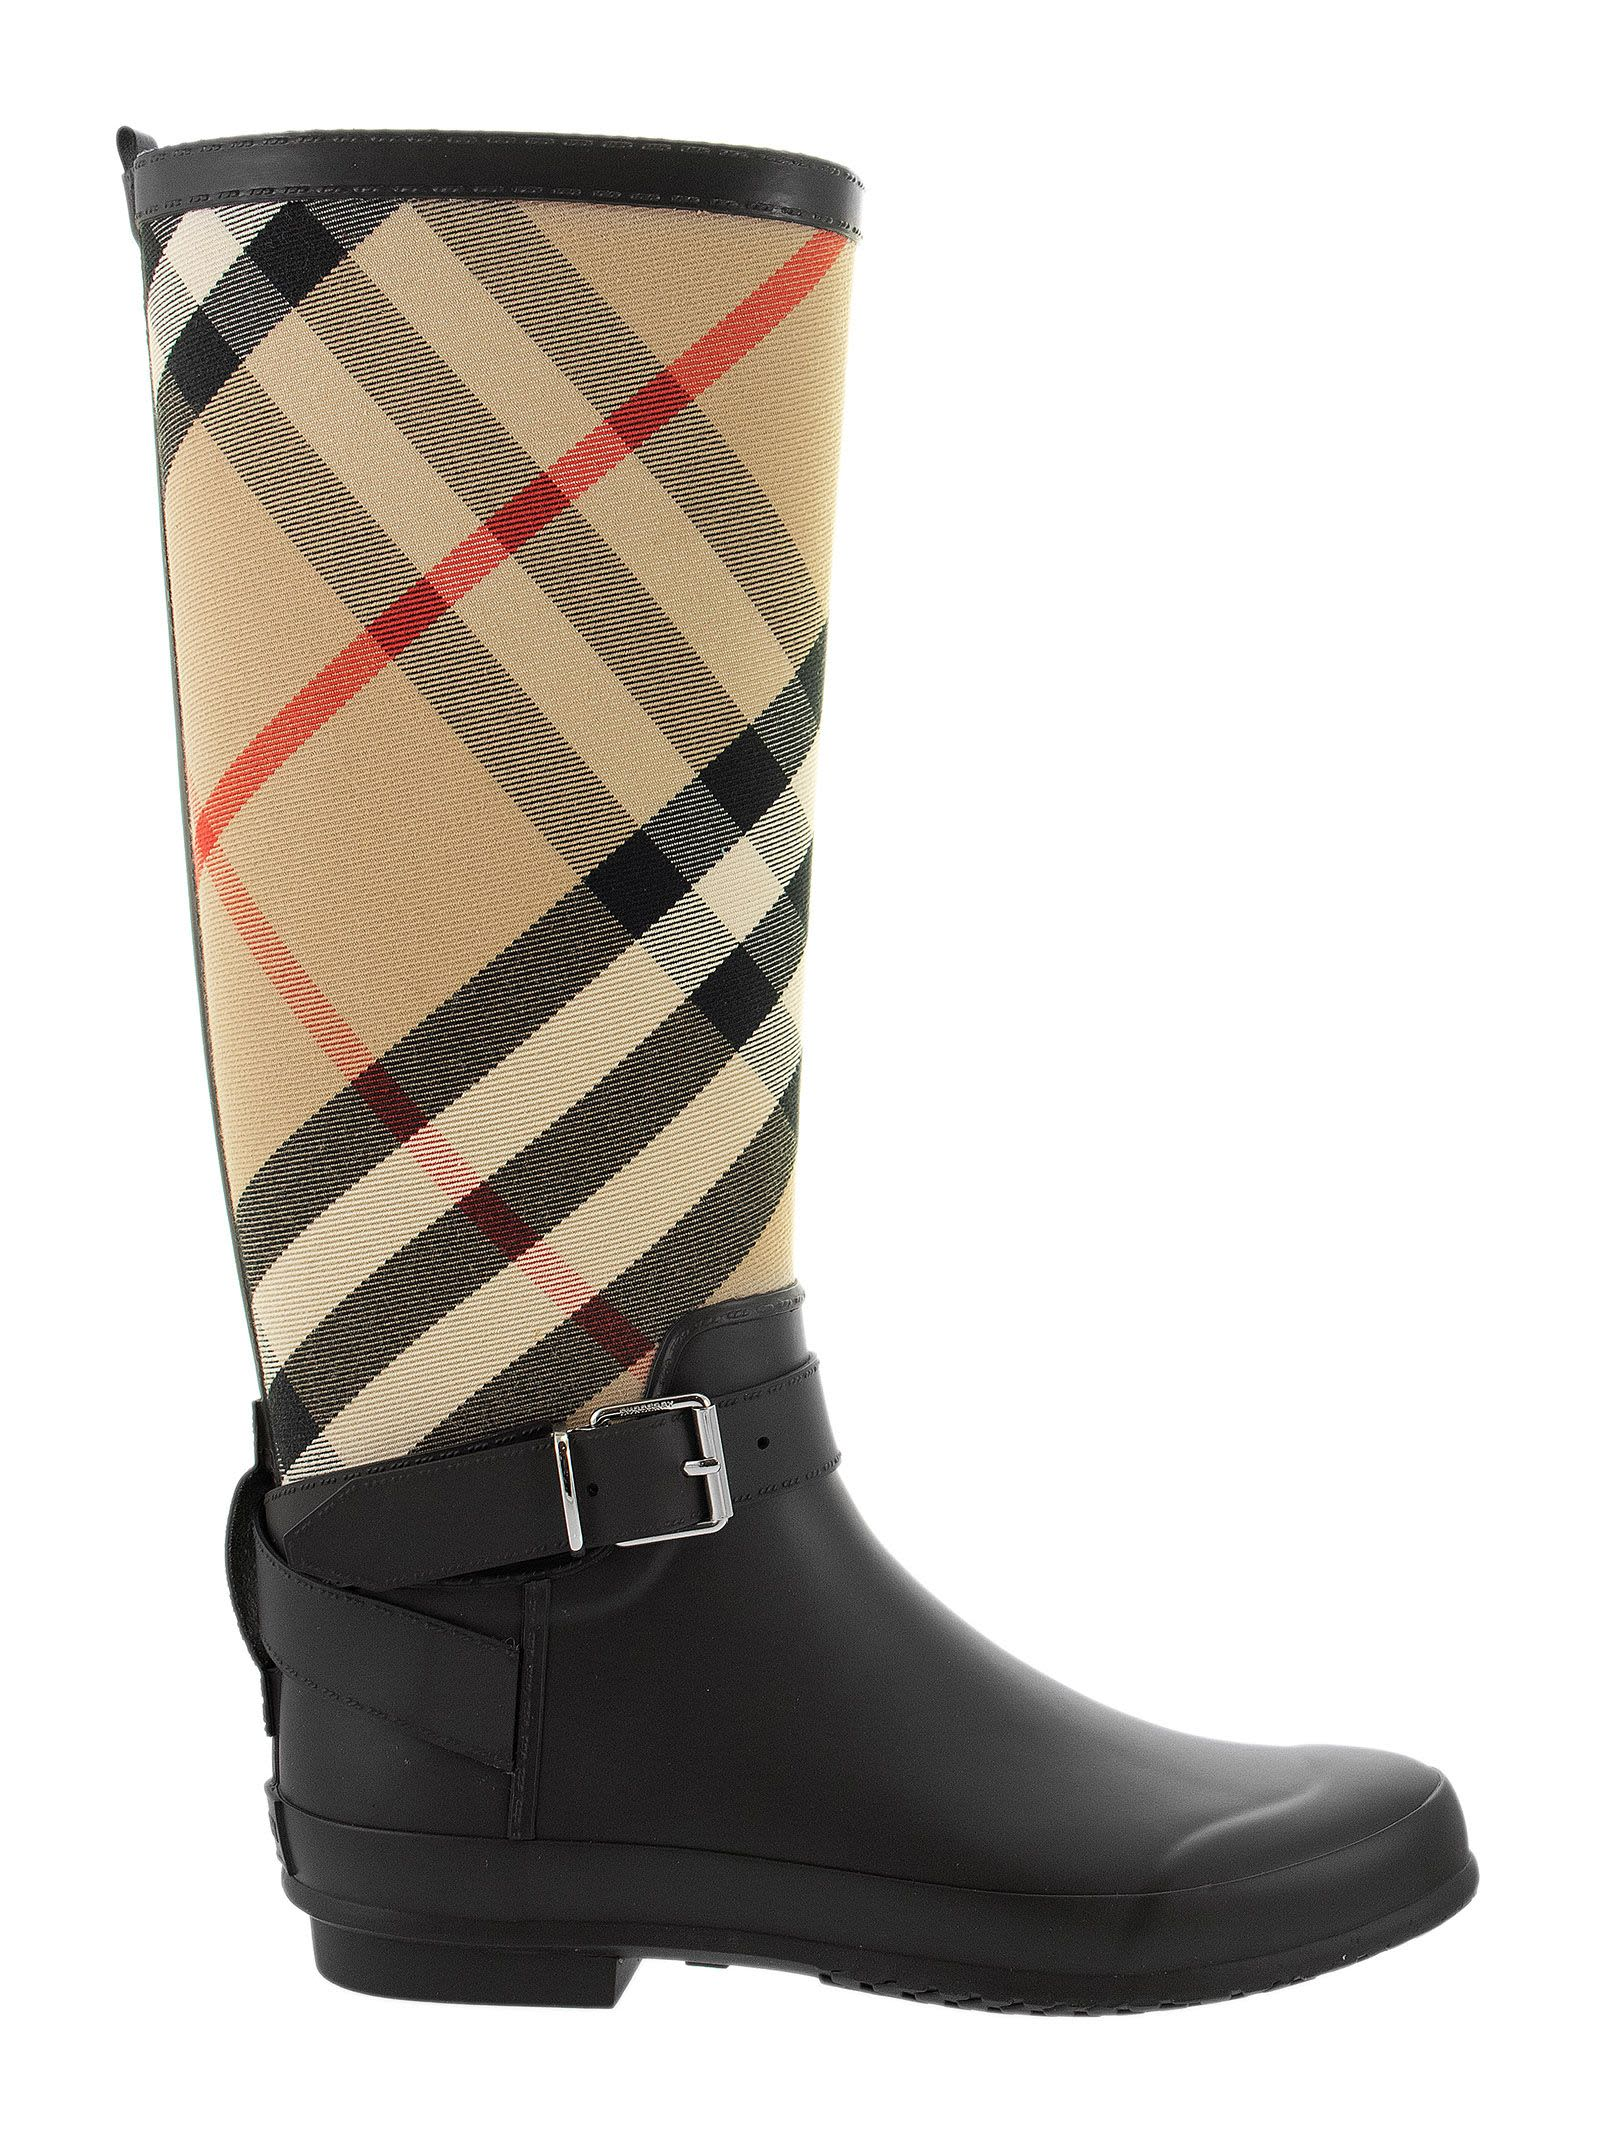 Buy Burberry Simeon - Tartan Rain Boots online, shop Burberry shoes with free shipping